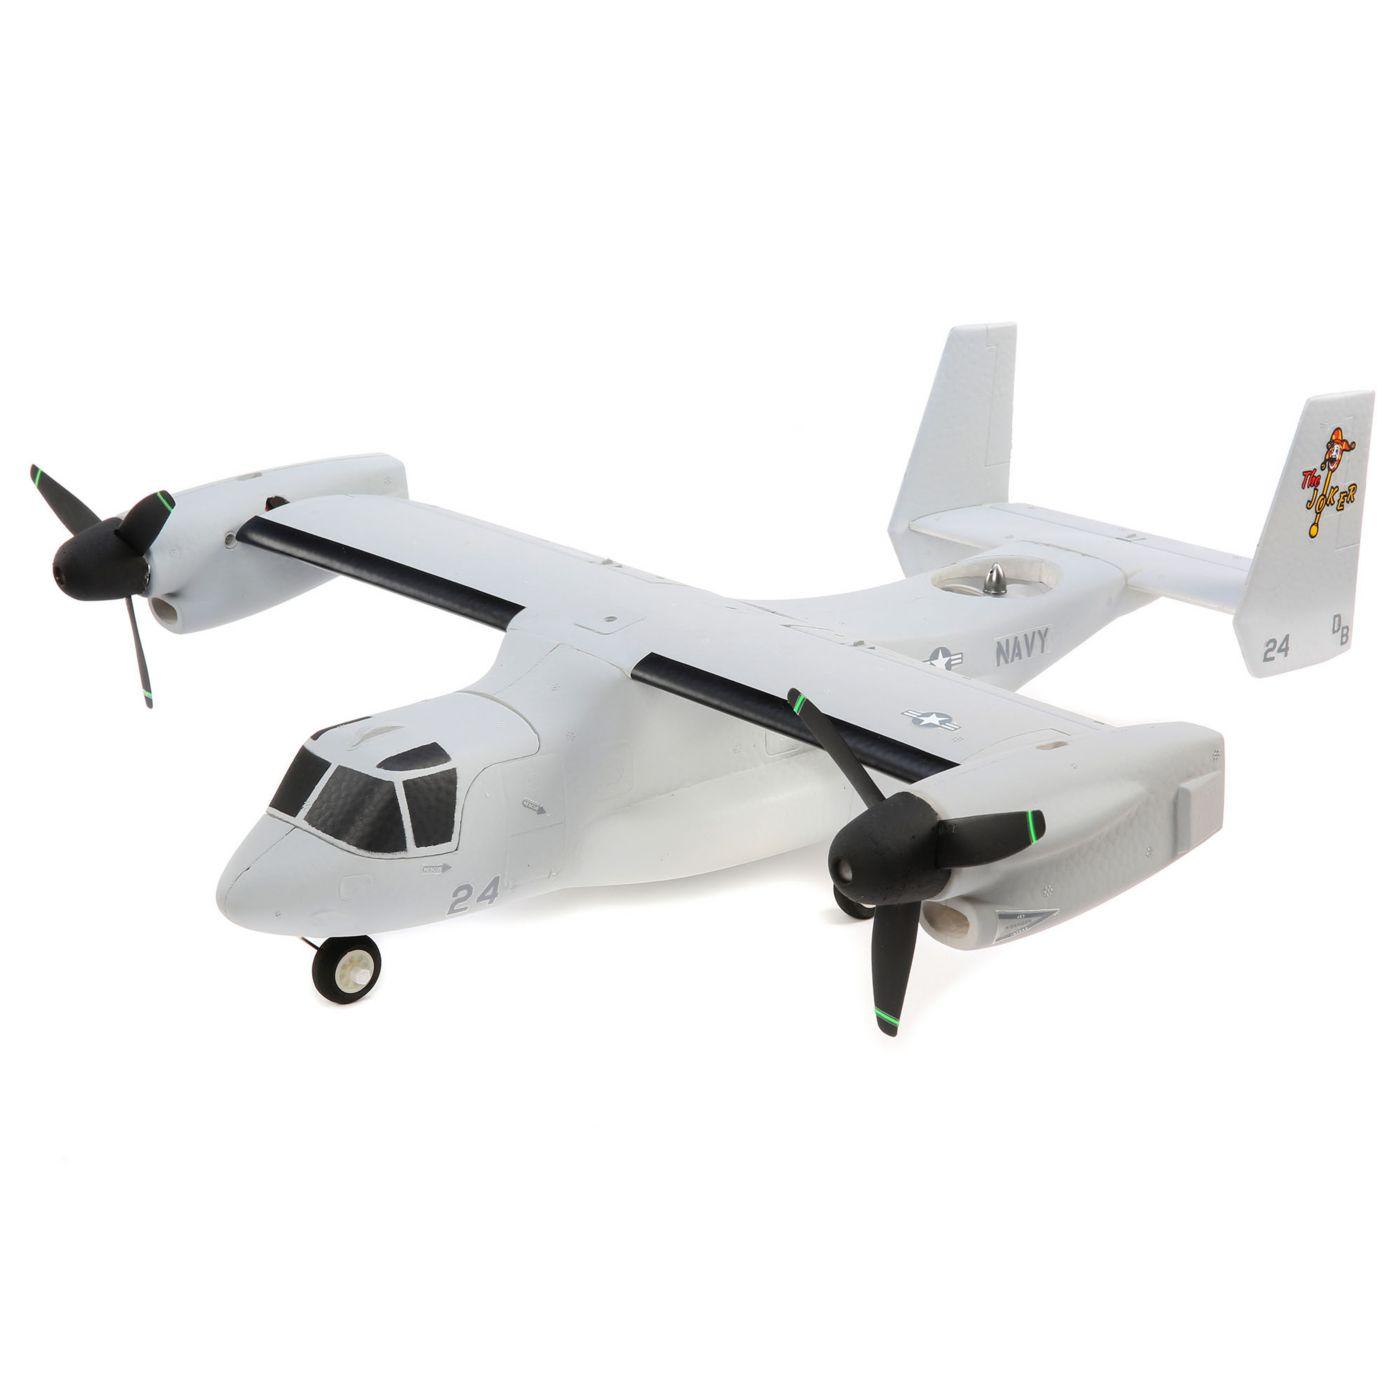 V-22 Osprey E-flite